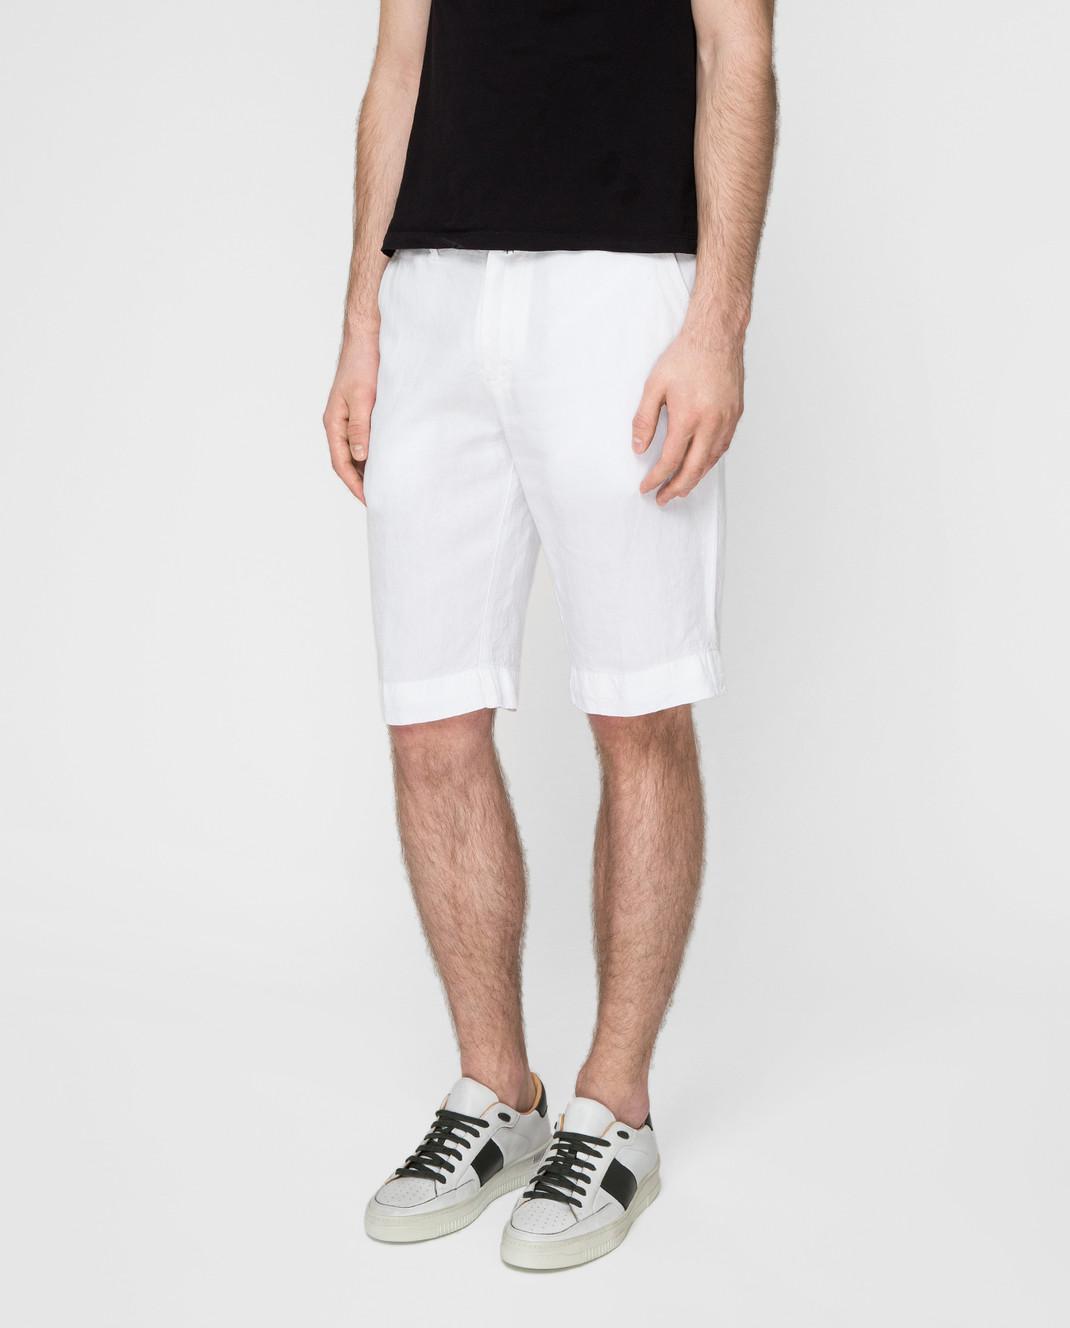 Kiton Белые шорты UPNJSBJ07R66 изображение 3